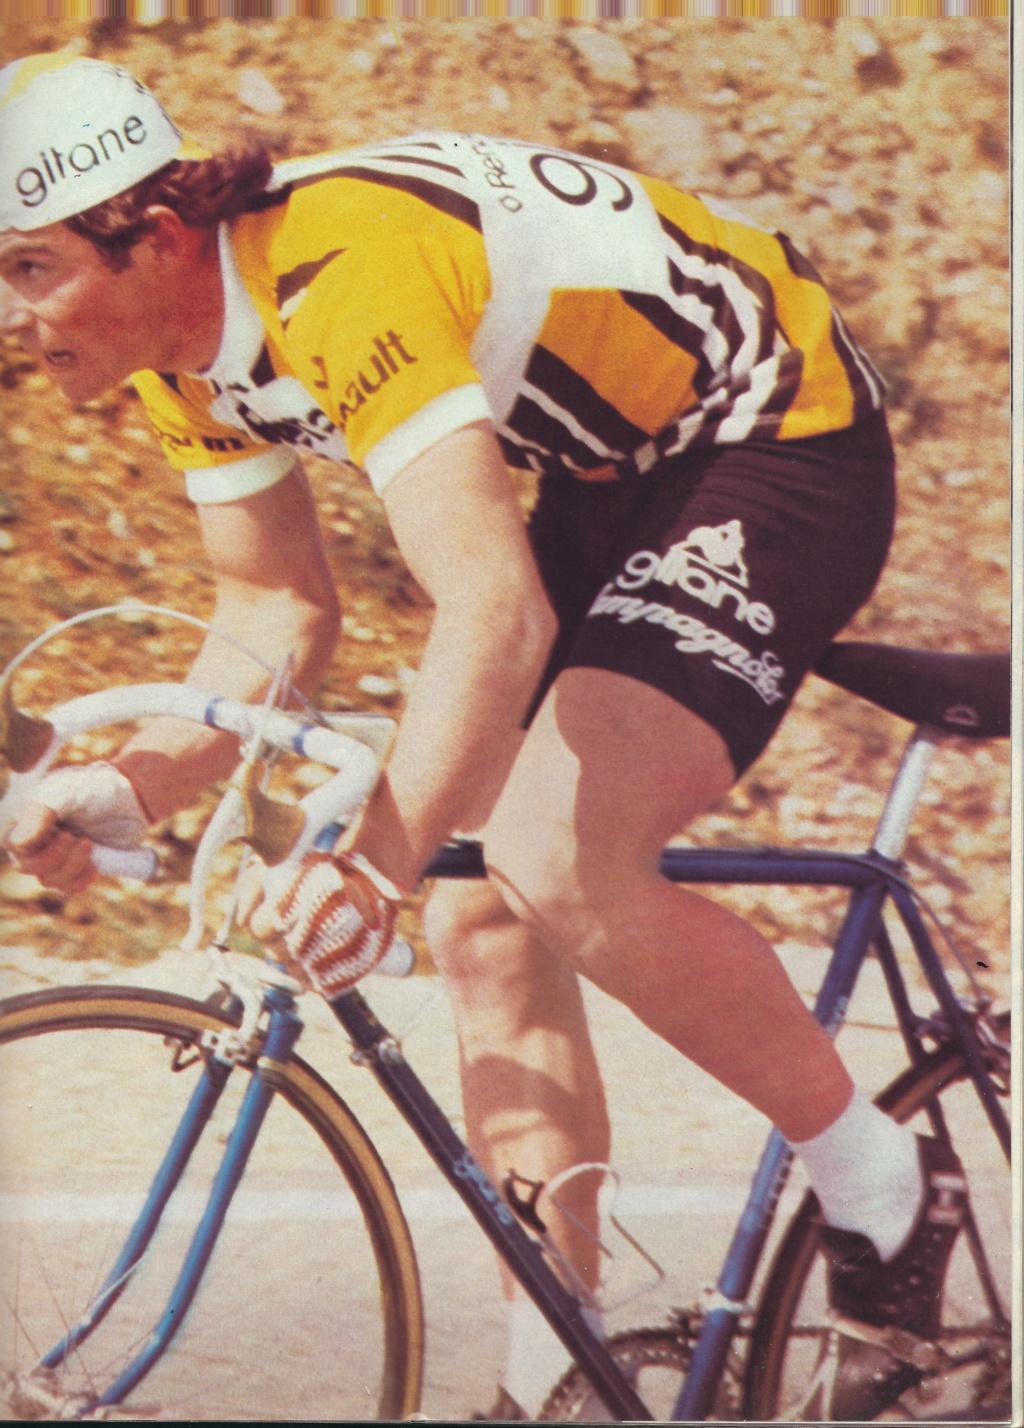 Gitane Olympic 1978 - Mod. 1863 Bh310